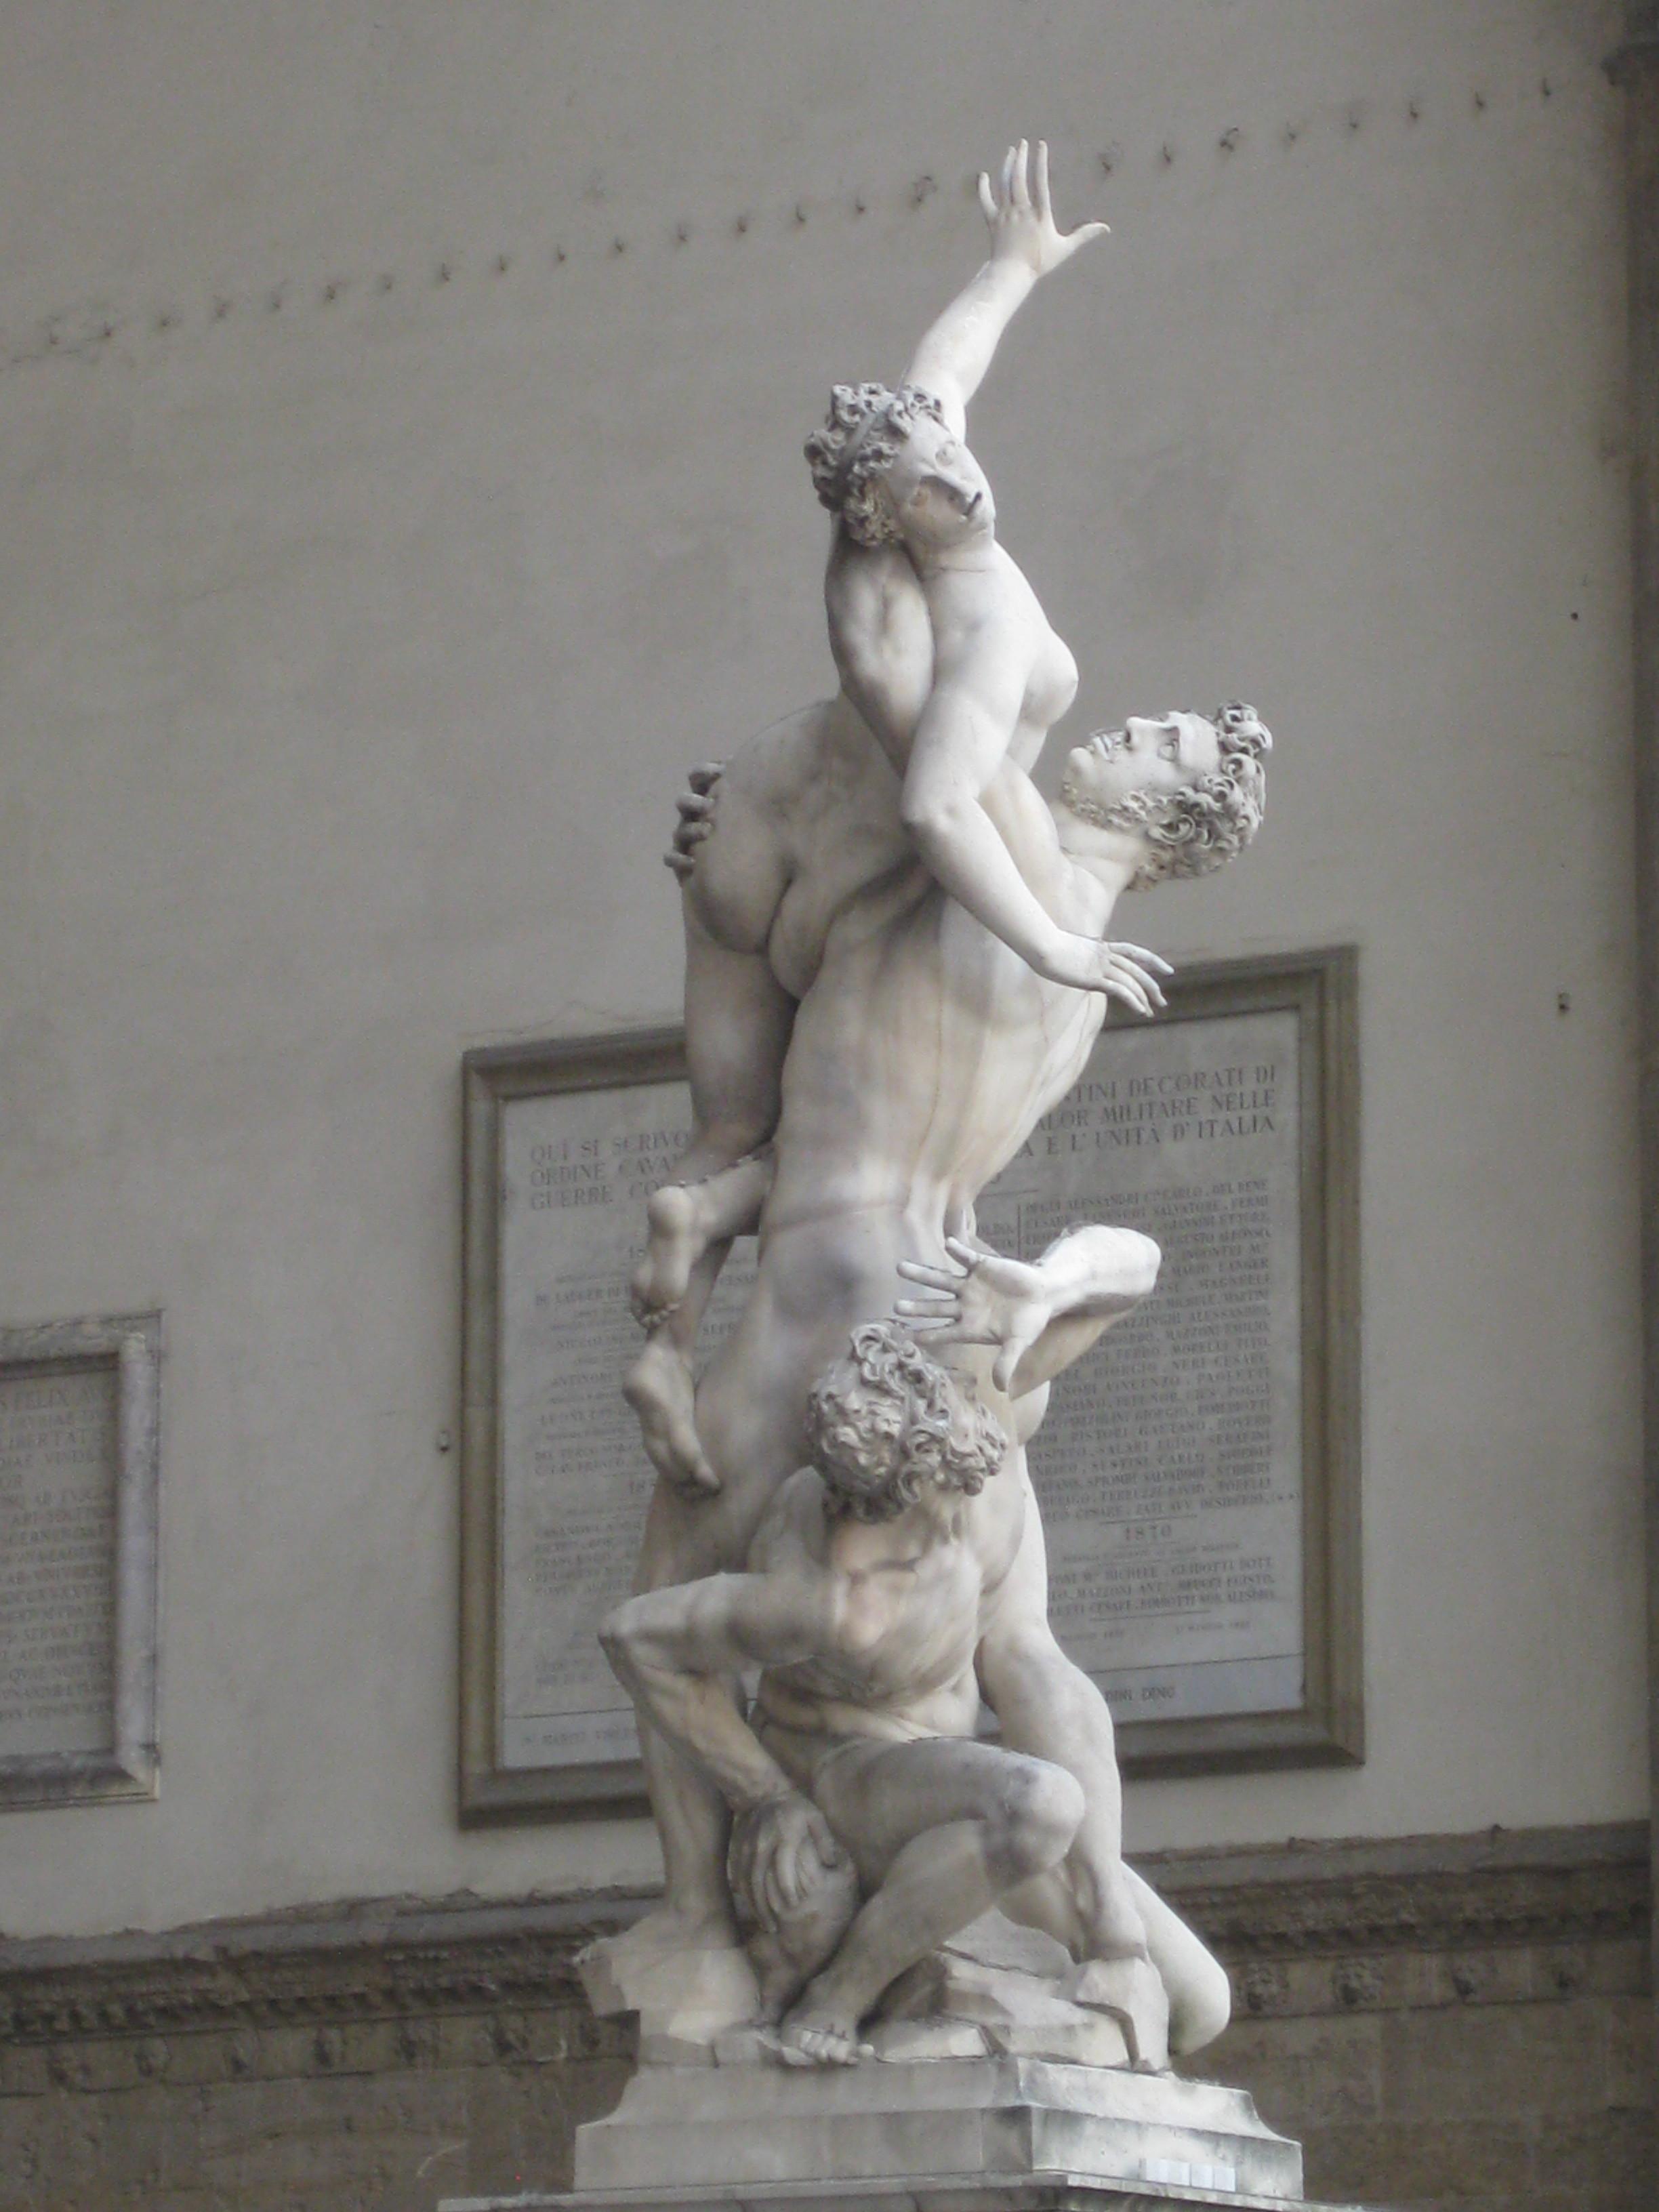 CRO Italy web 2013 - 036.JPG